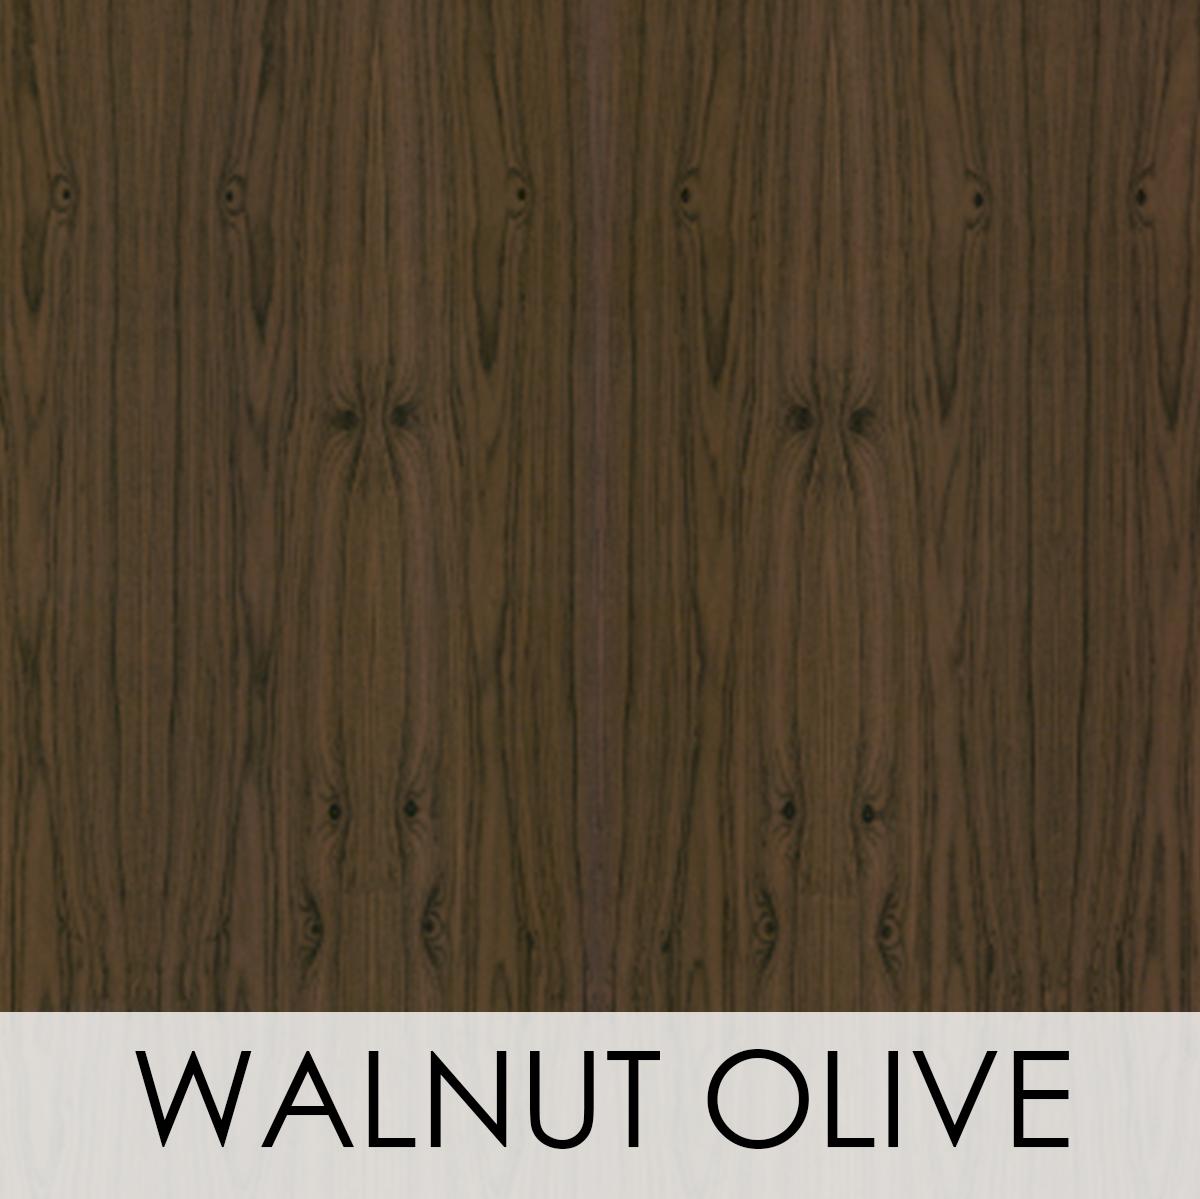 Walnut Olive Wood Veneer Wallcovering